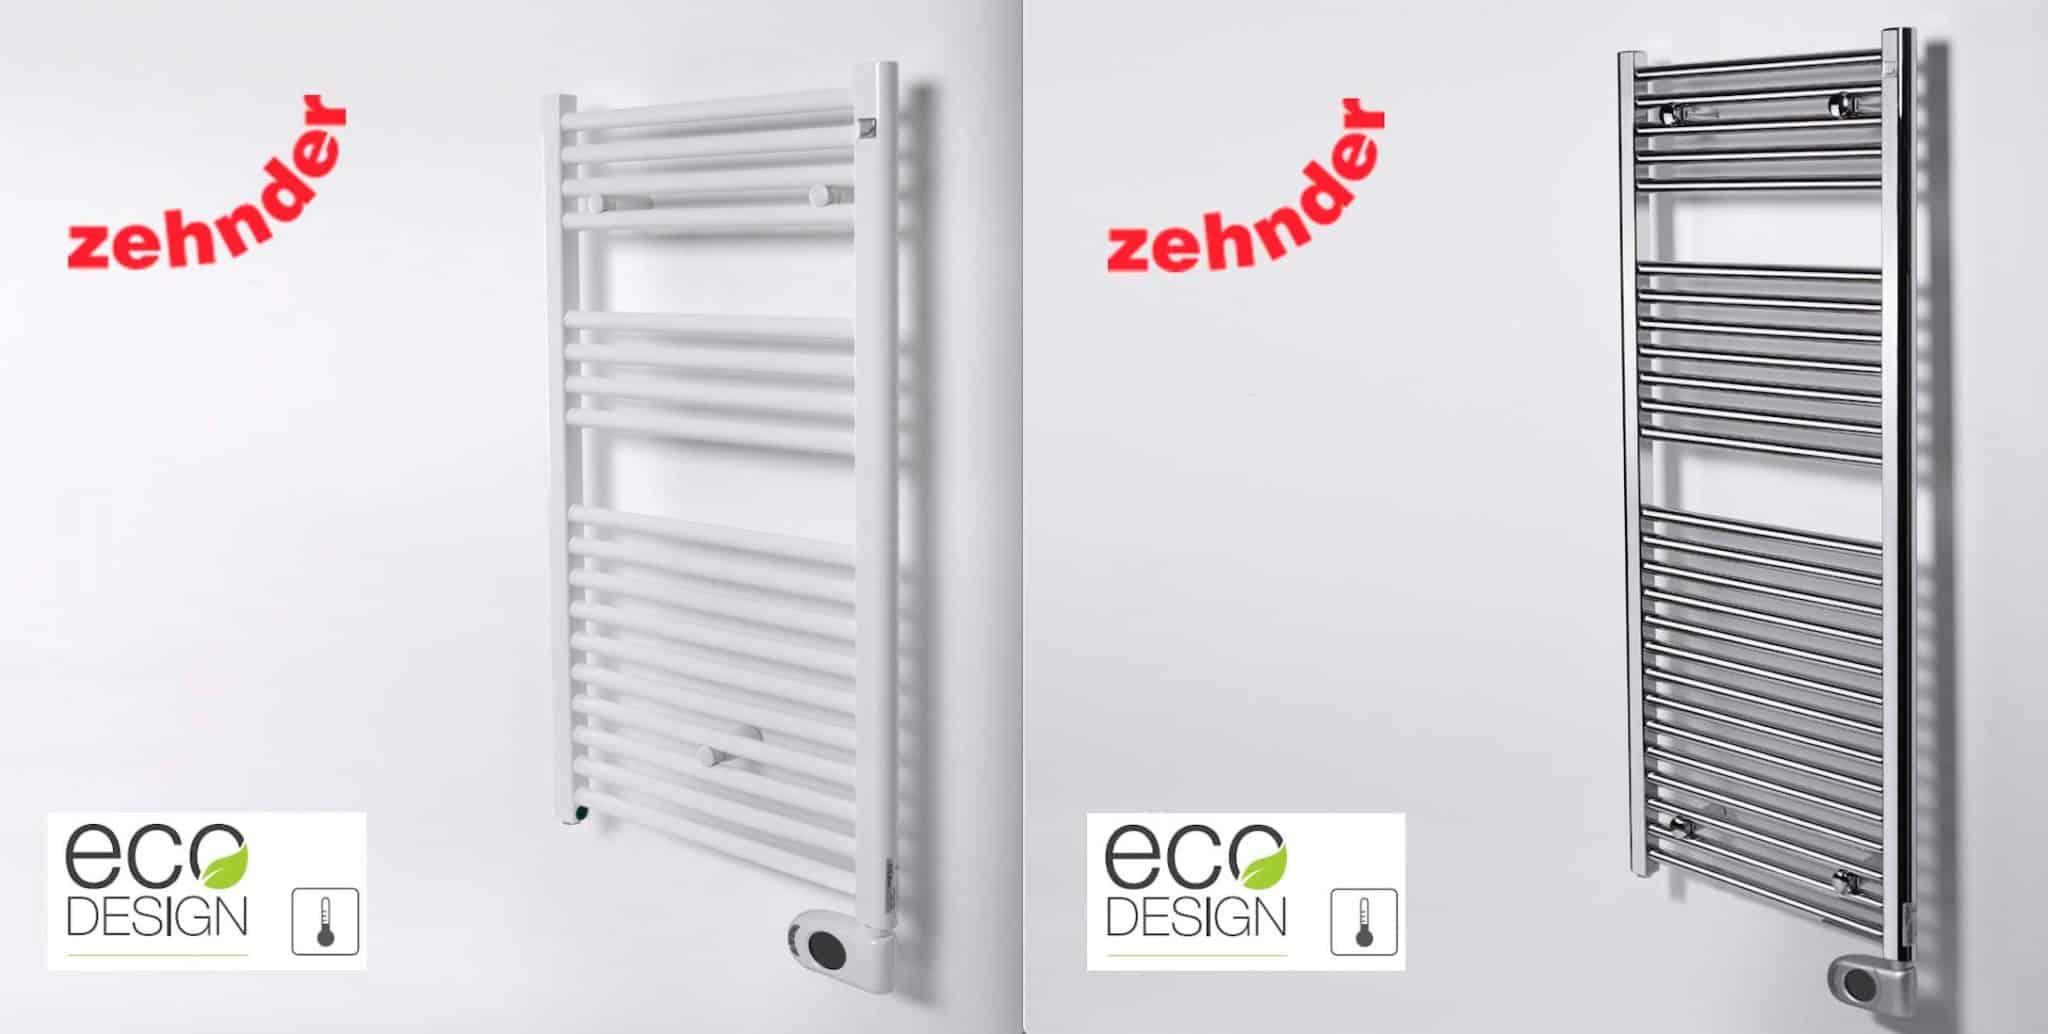 Zehnder Aura электрическая версия